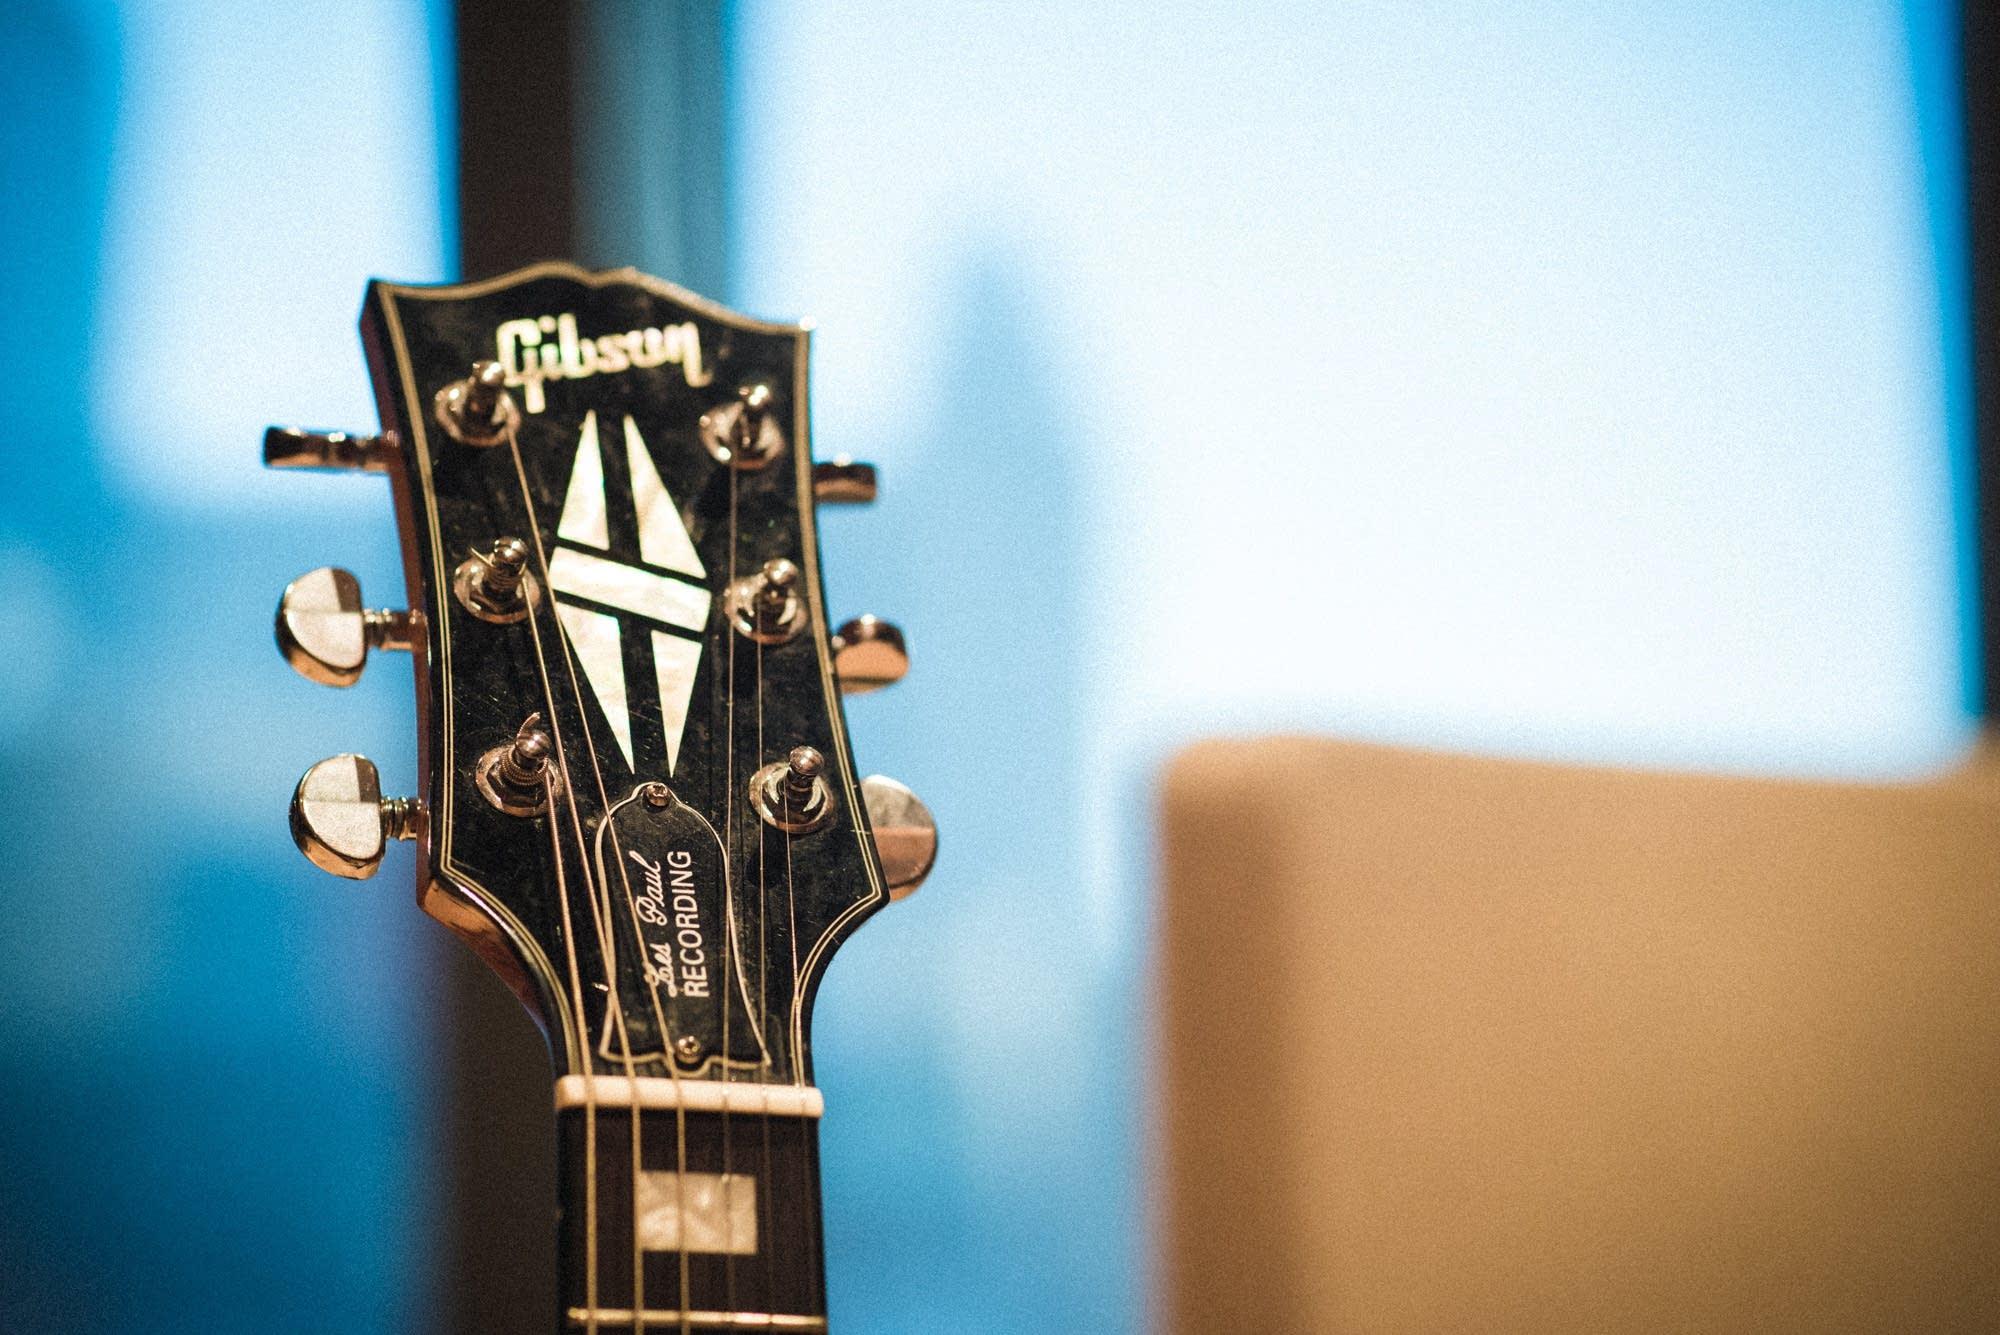 Gibson Les Paul - 3